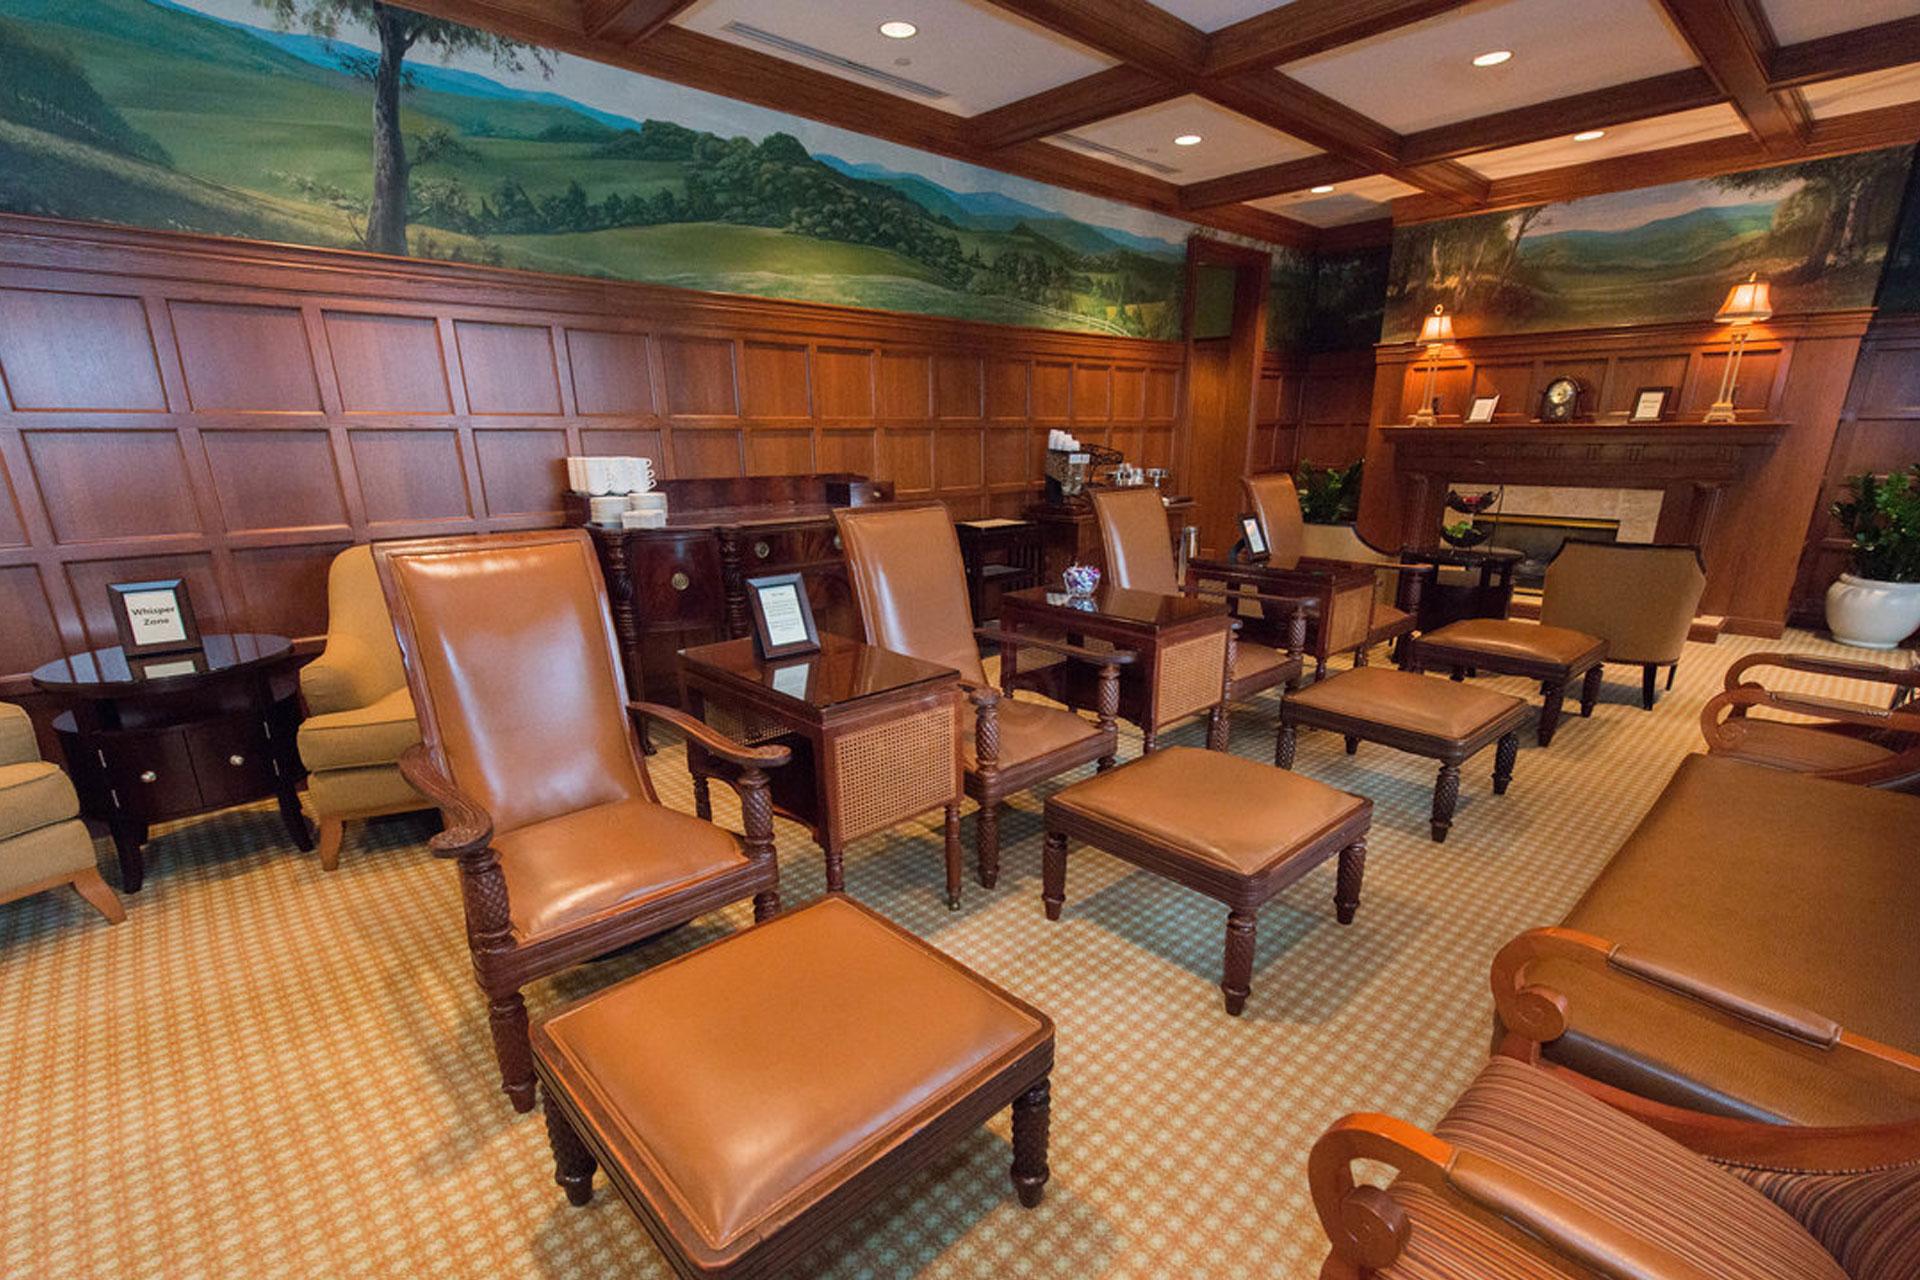 Spa at The Hotel Hershey; TripAdvisor Expert Photo